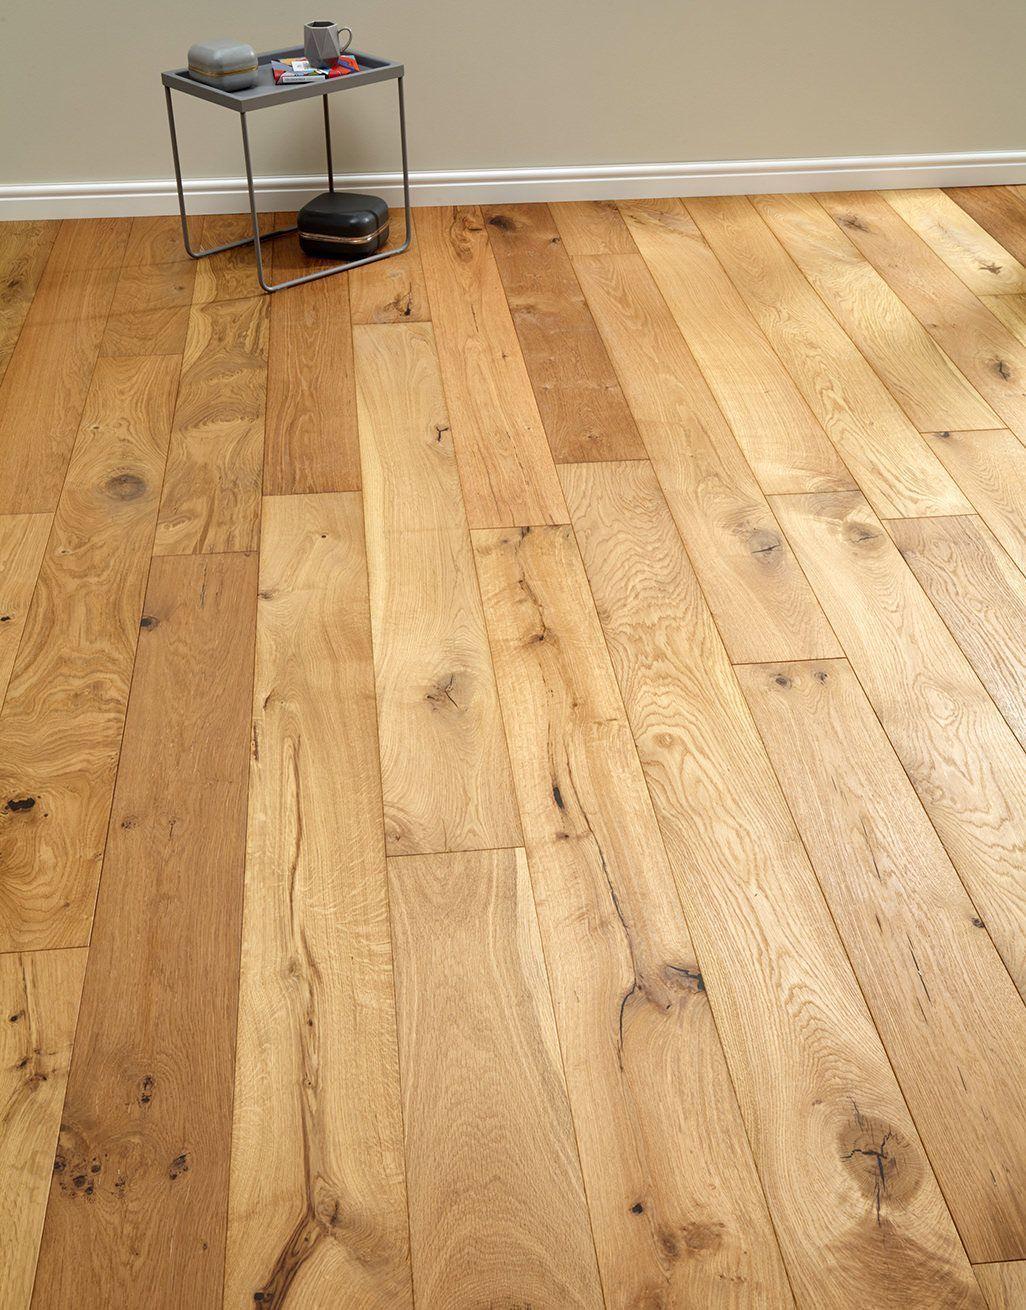 Manhattan Natural Oak Brushed & Oiled Engineered Wood Flooring | Direct Wood Flooring